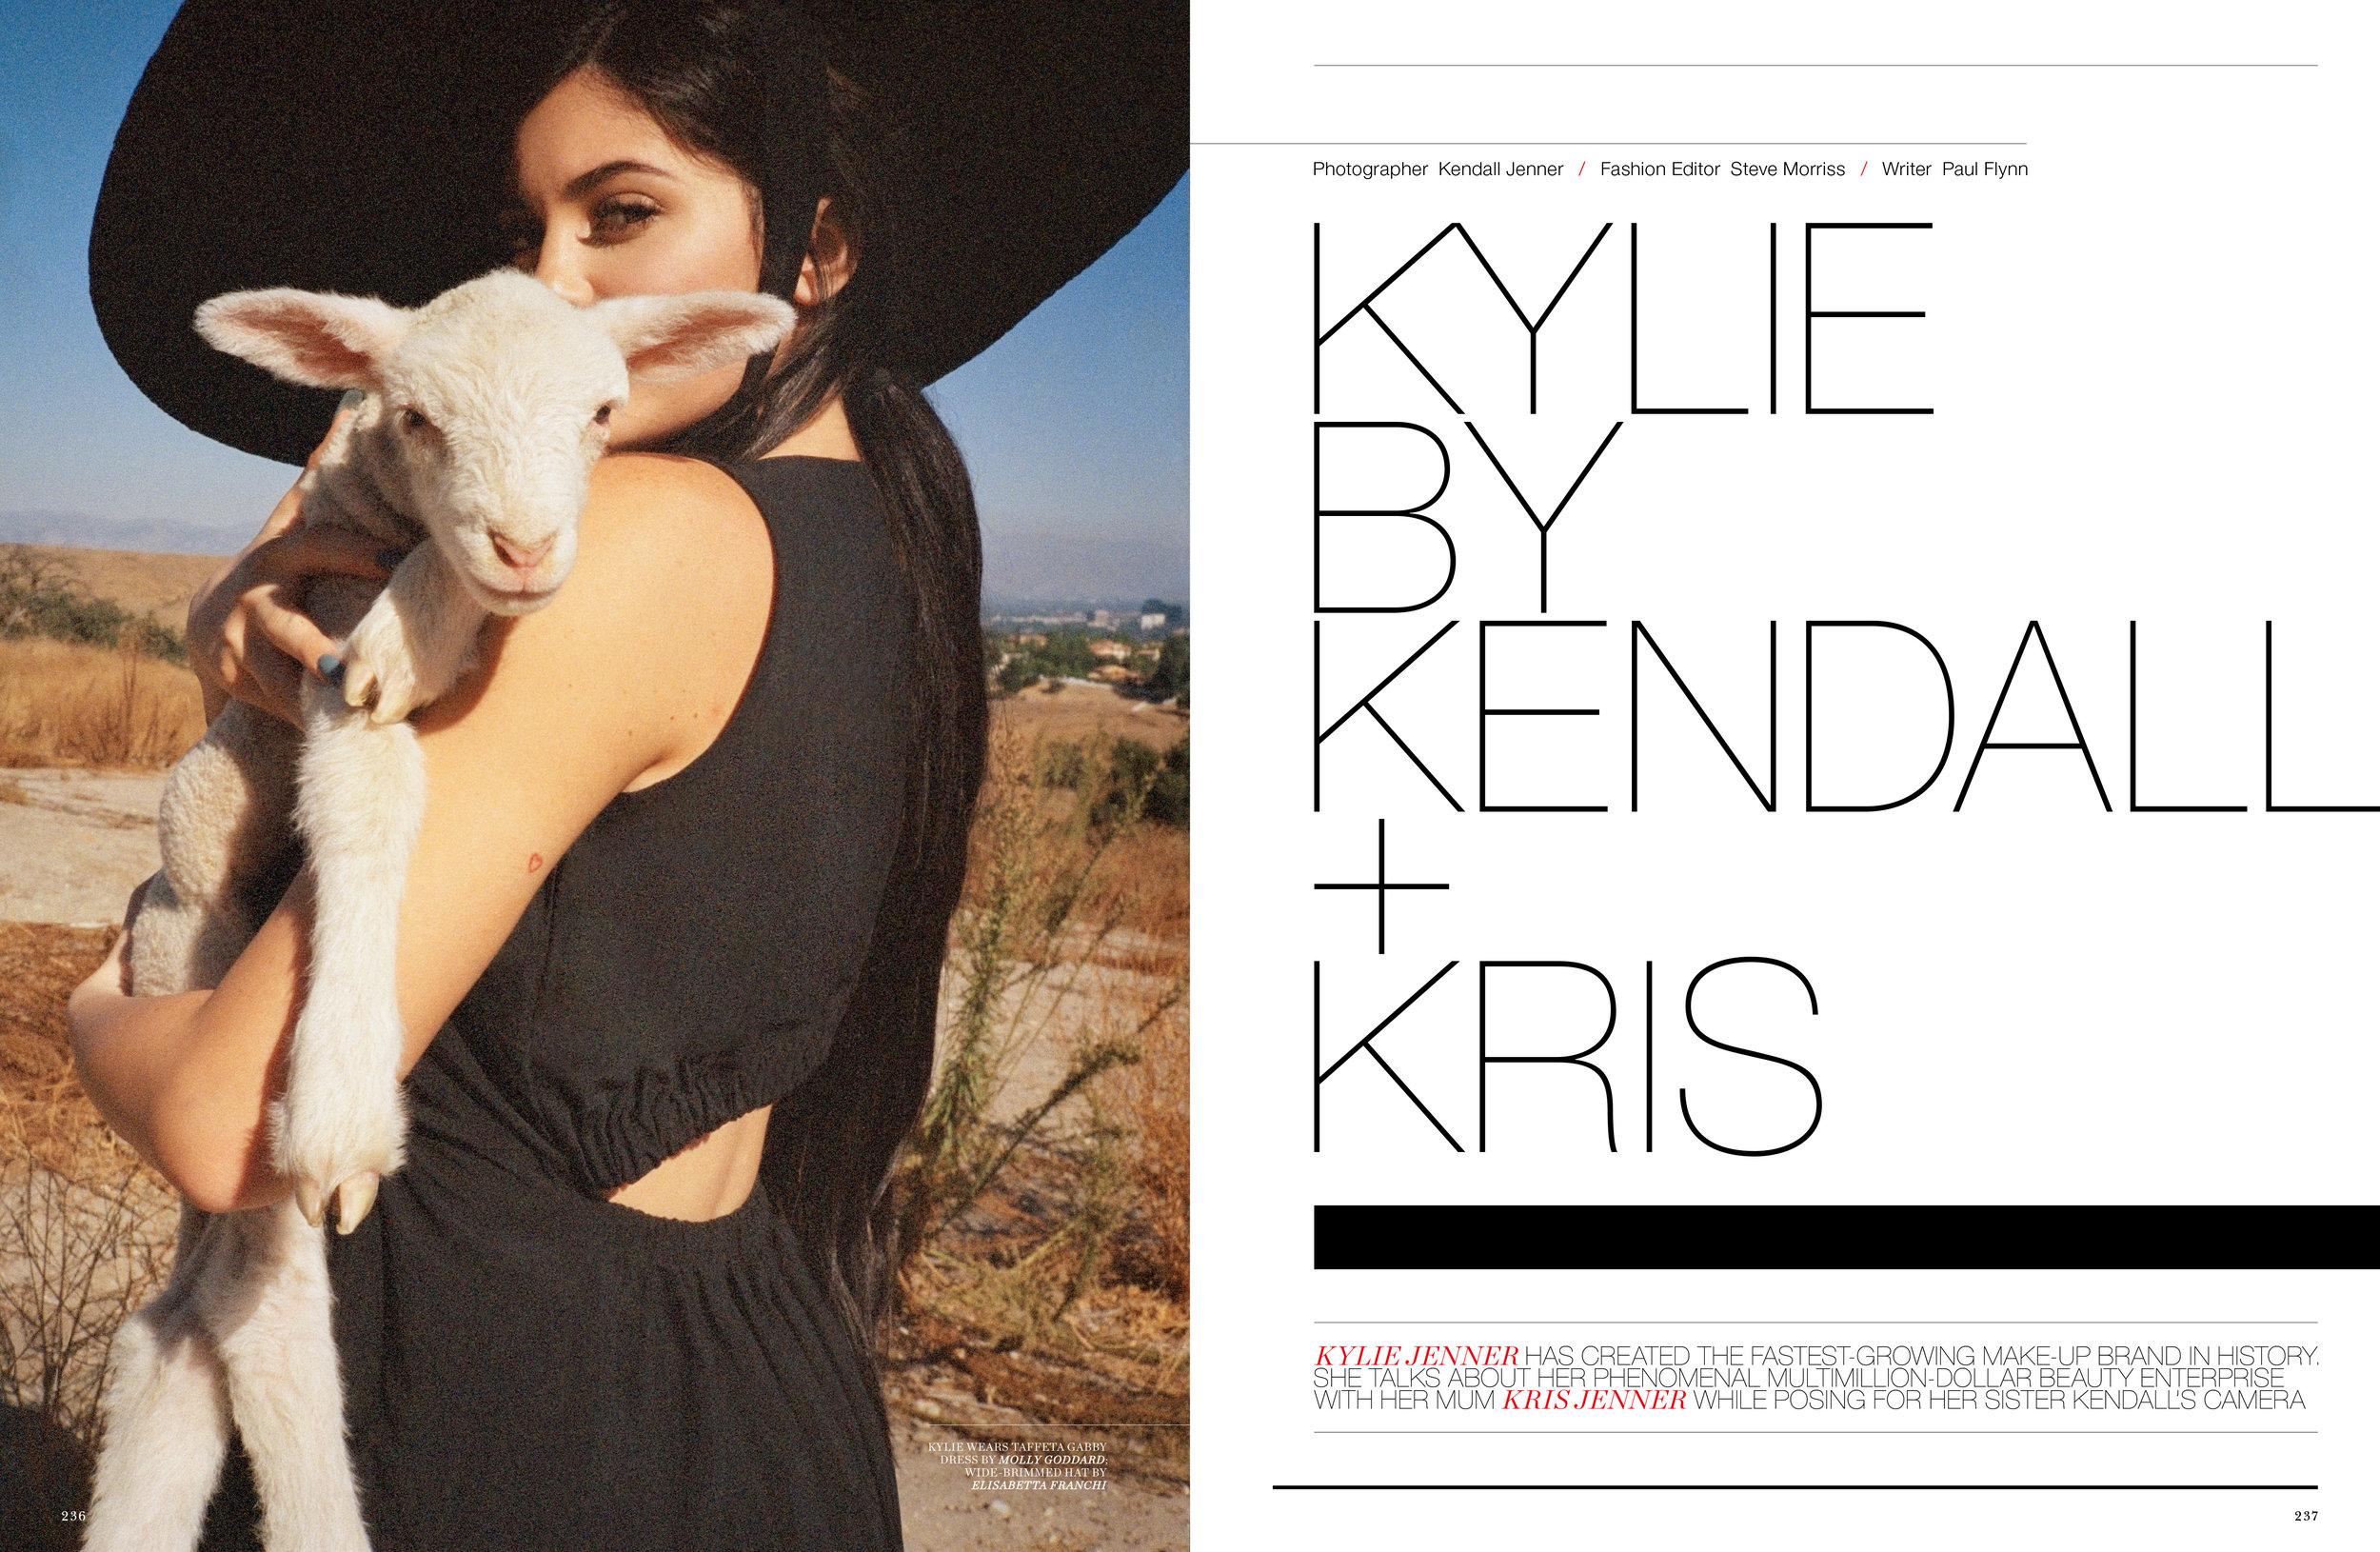 KendallJenner_Kylie_HR-1.jpg